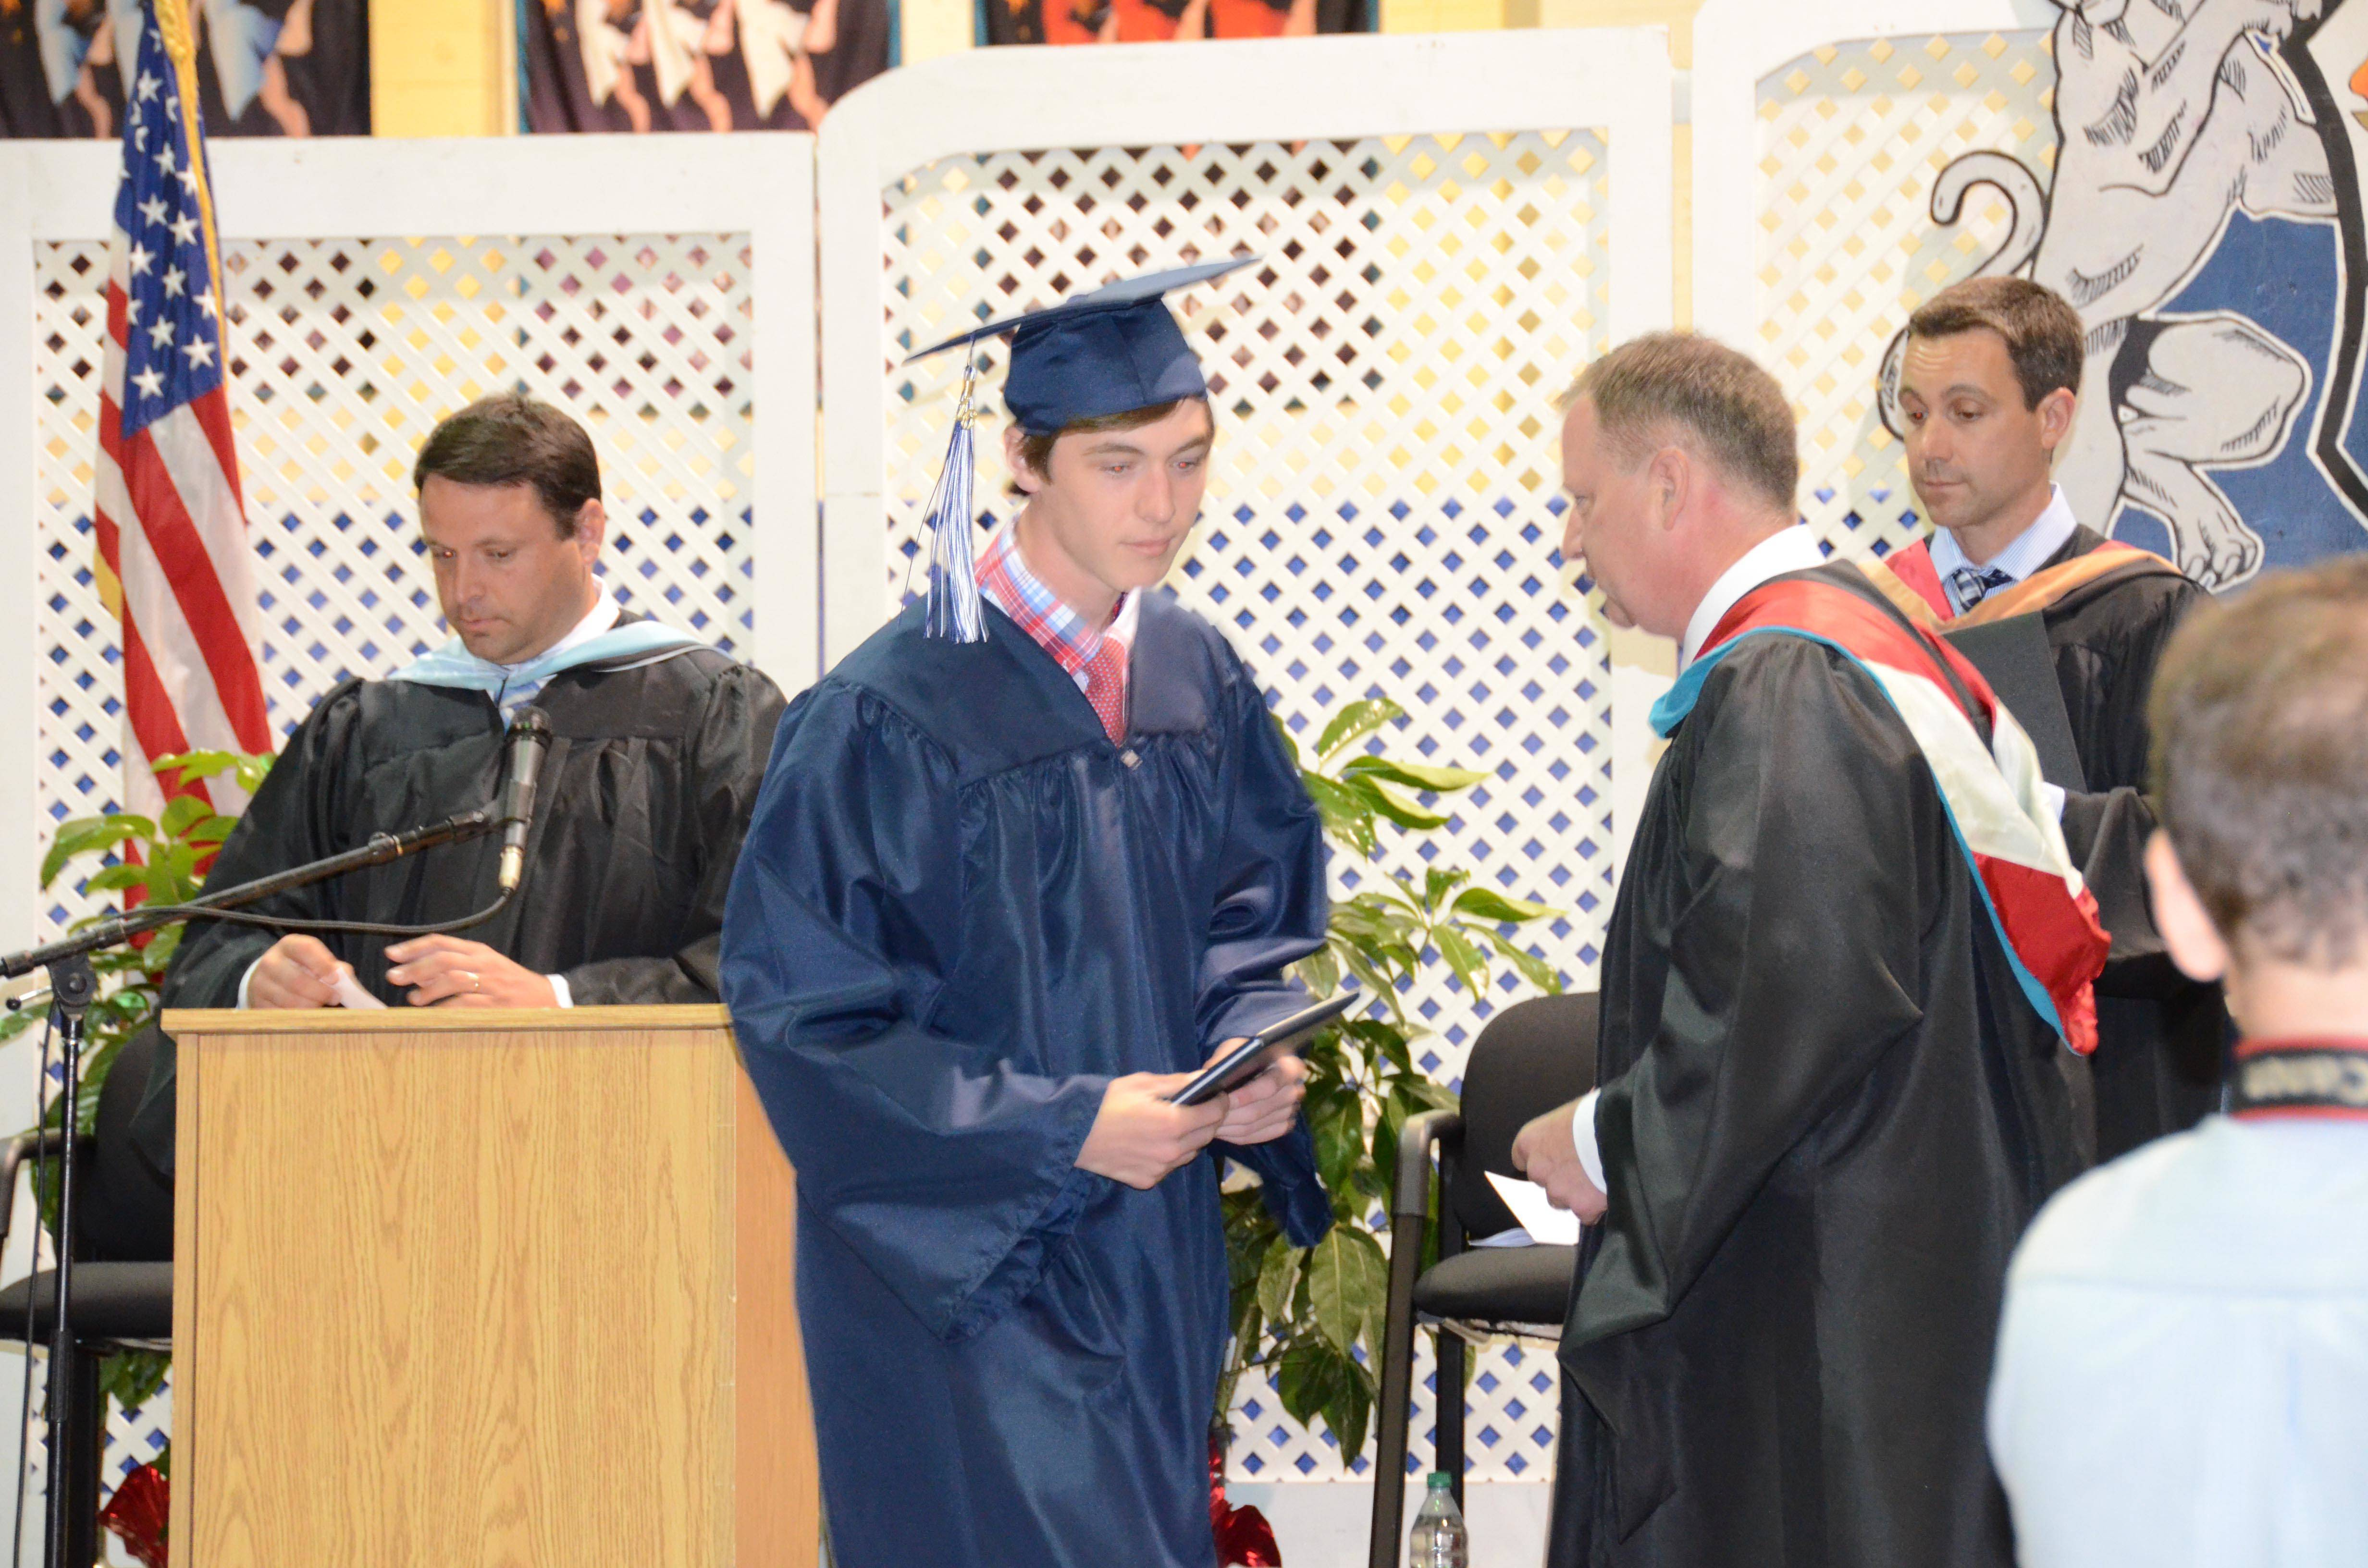 e038155f522e931c4299_CHS_Graduation_2016_ACZ_DSC_2198.jpg